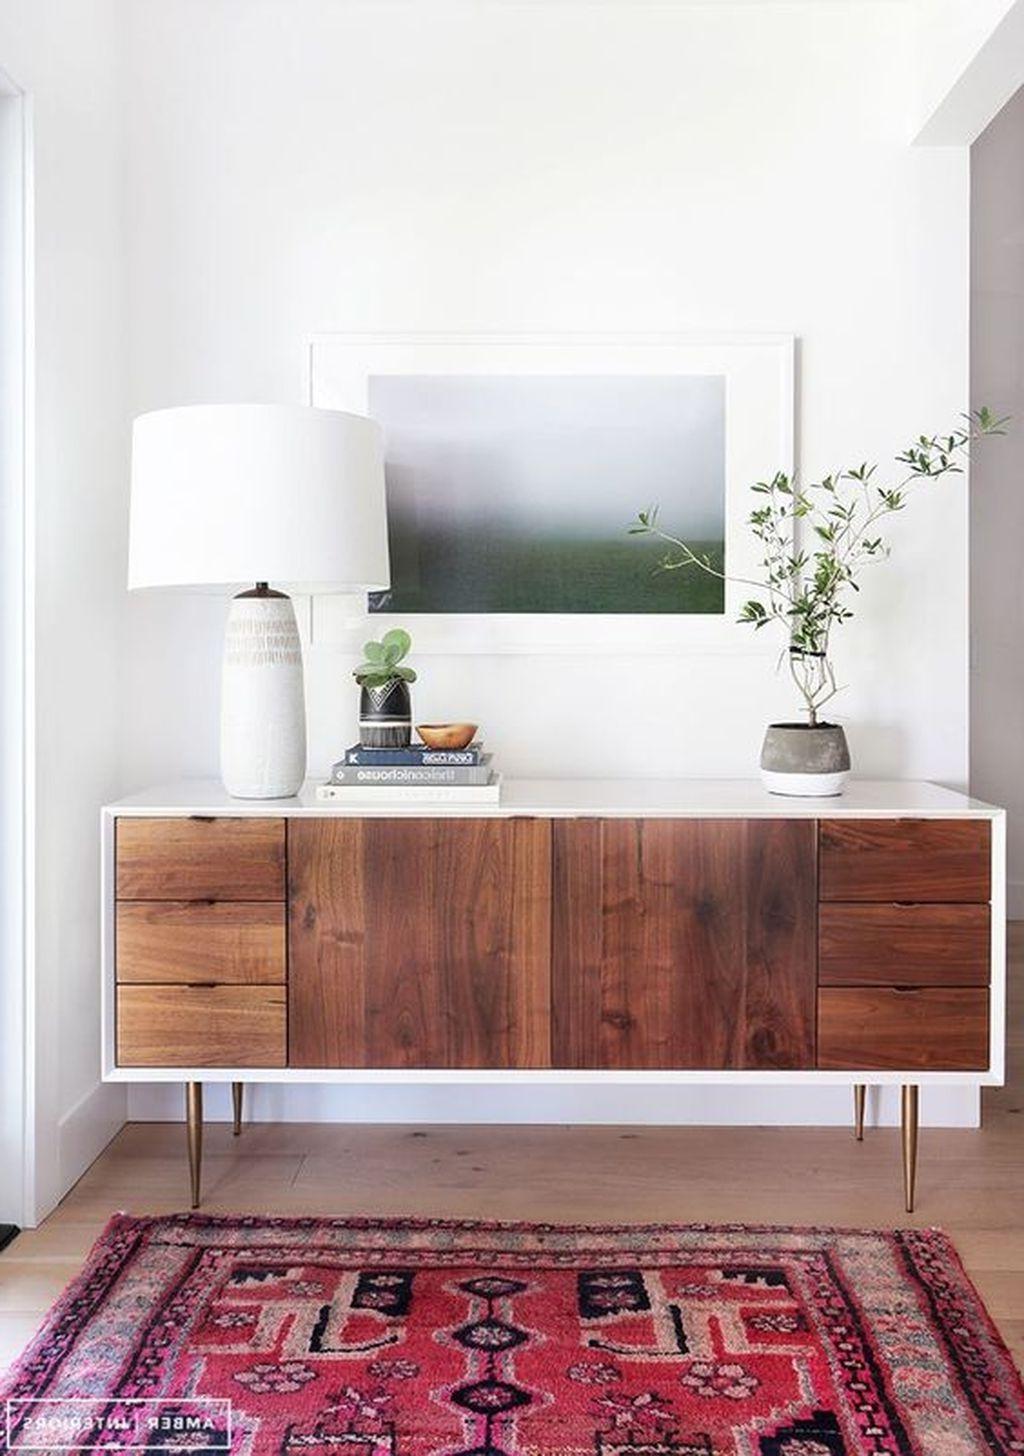 35 Inspiring Mid Century Modern Furniture Ideas | Furniture With Regard To Summer Desire Credenzas (View 2 of 20)